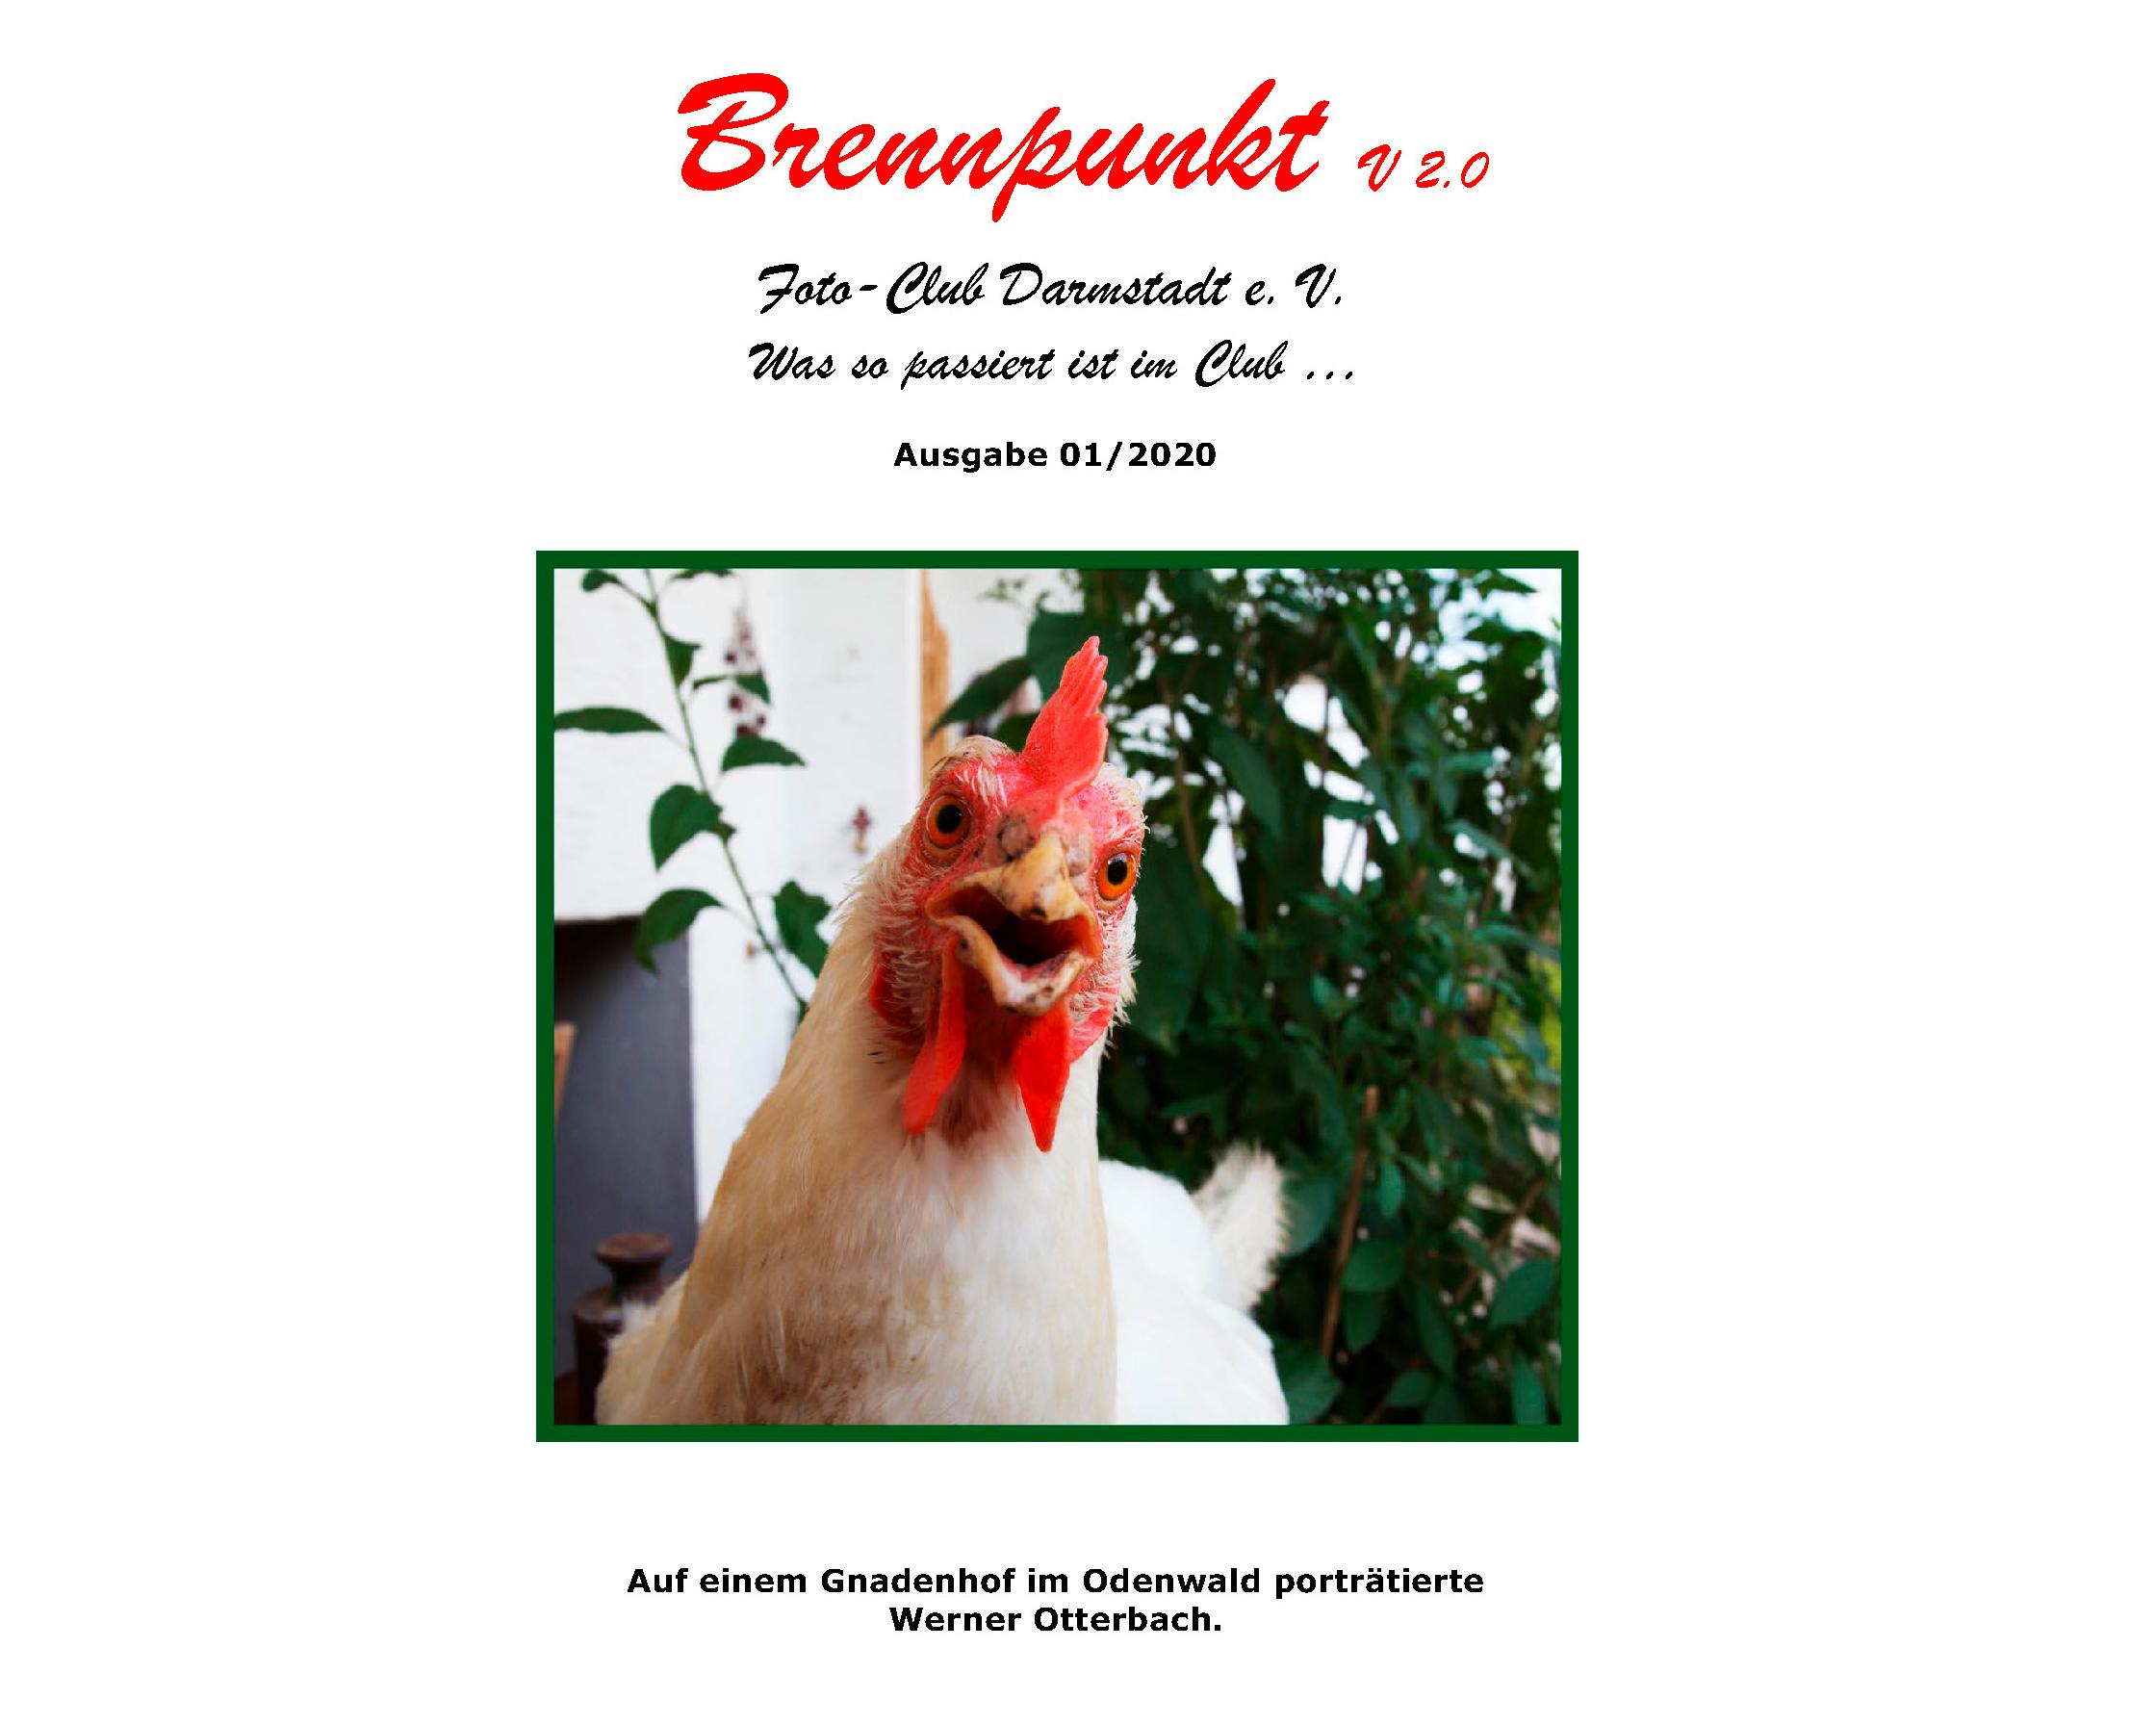 http://fotoclub-darmstadt.de/wp-content/uploads/2020/05/Brennpunkt2020Nr01Druck.pdf